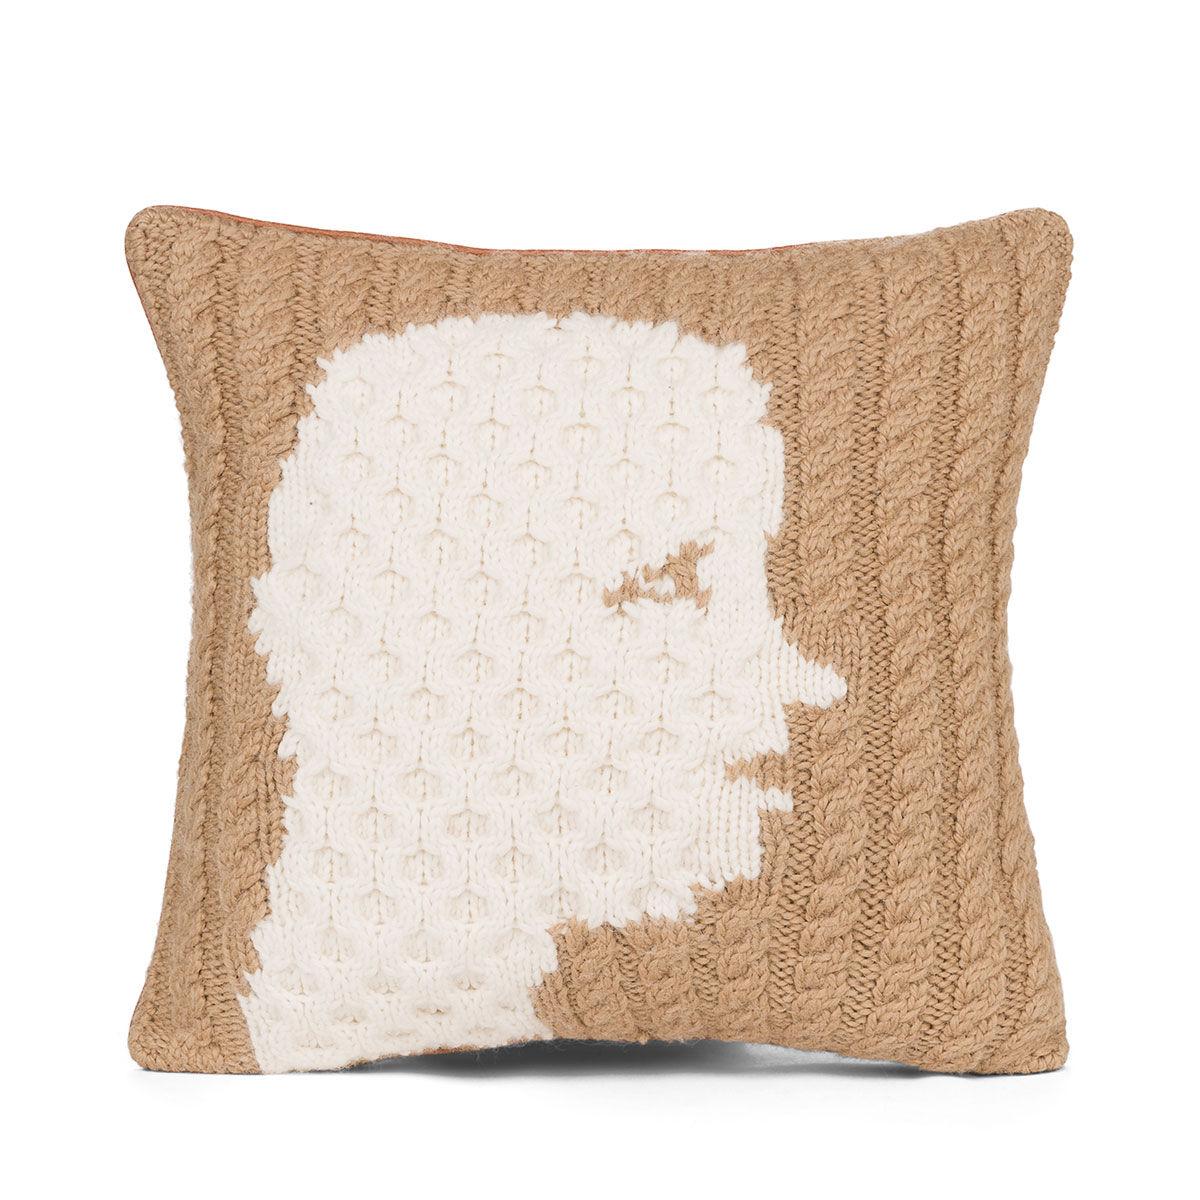 LOEWE Hand Knitted Cushion 2 40X40 camel/white all